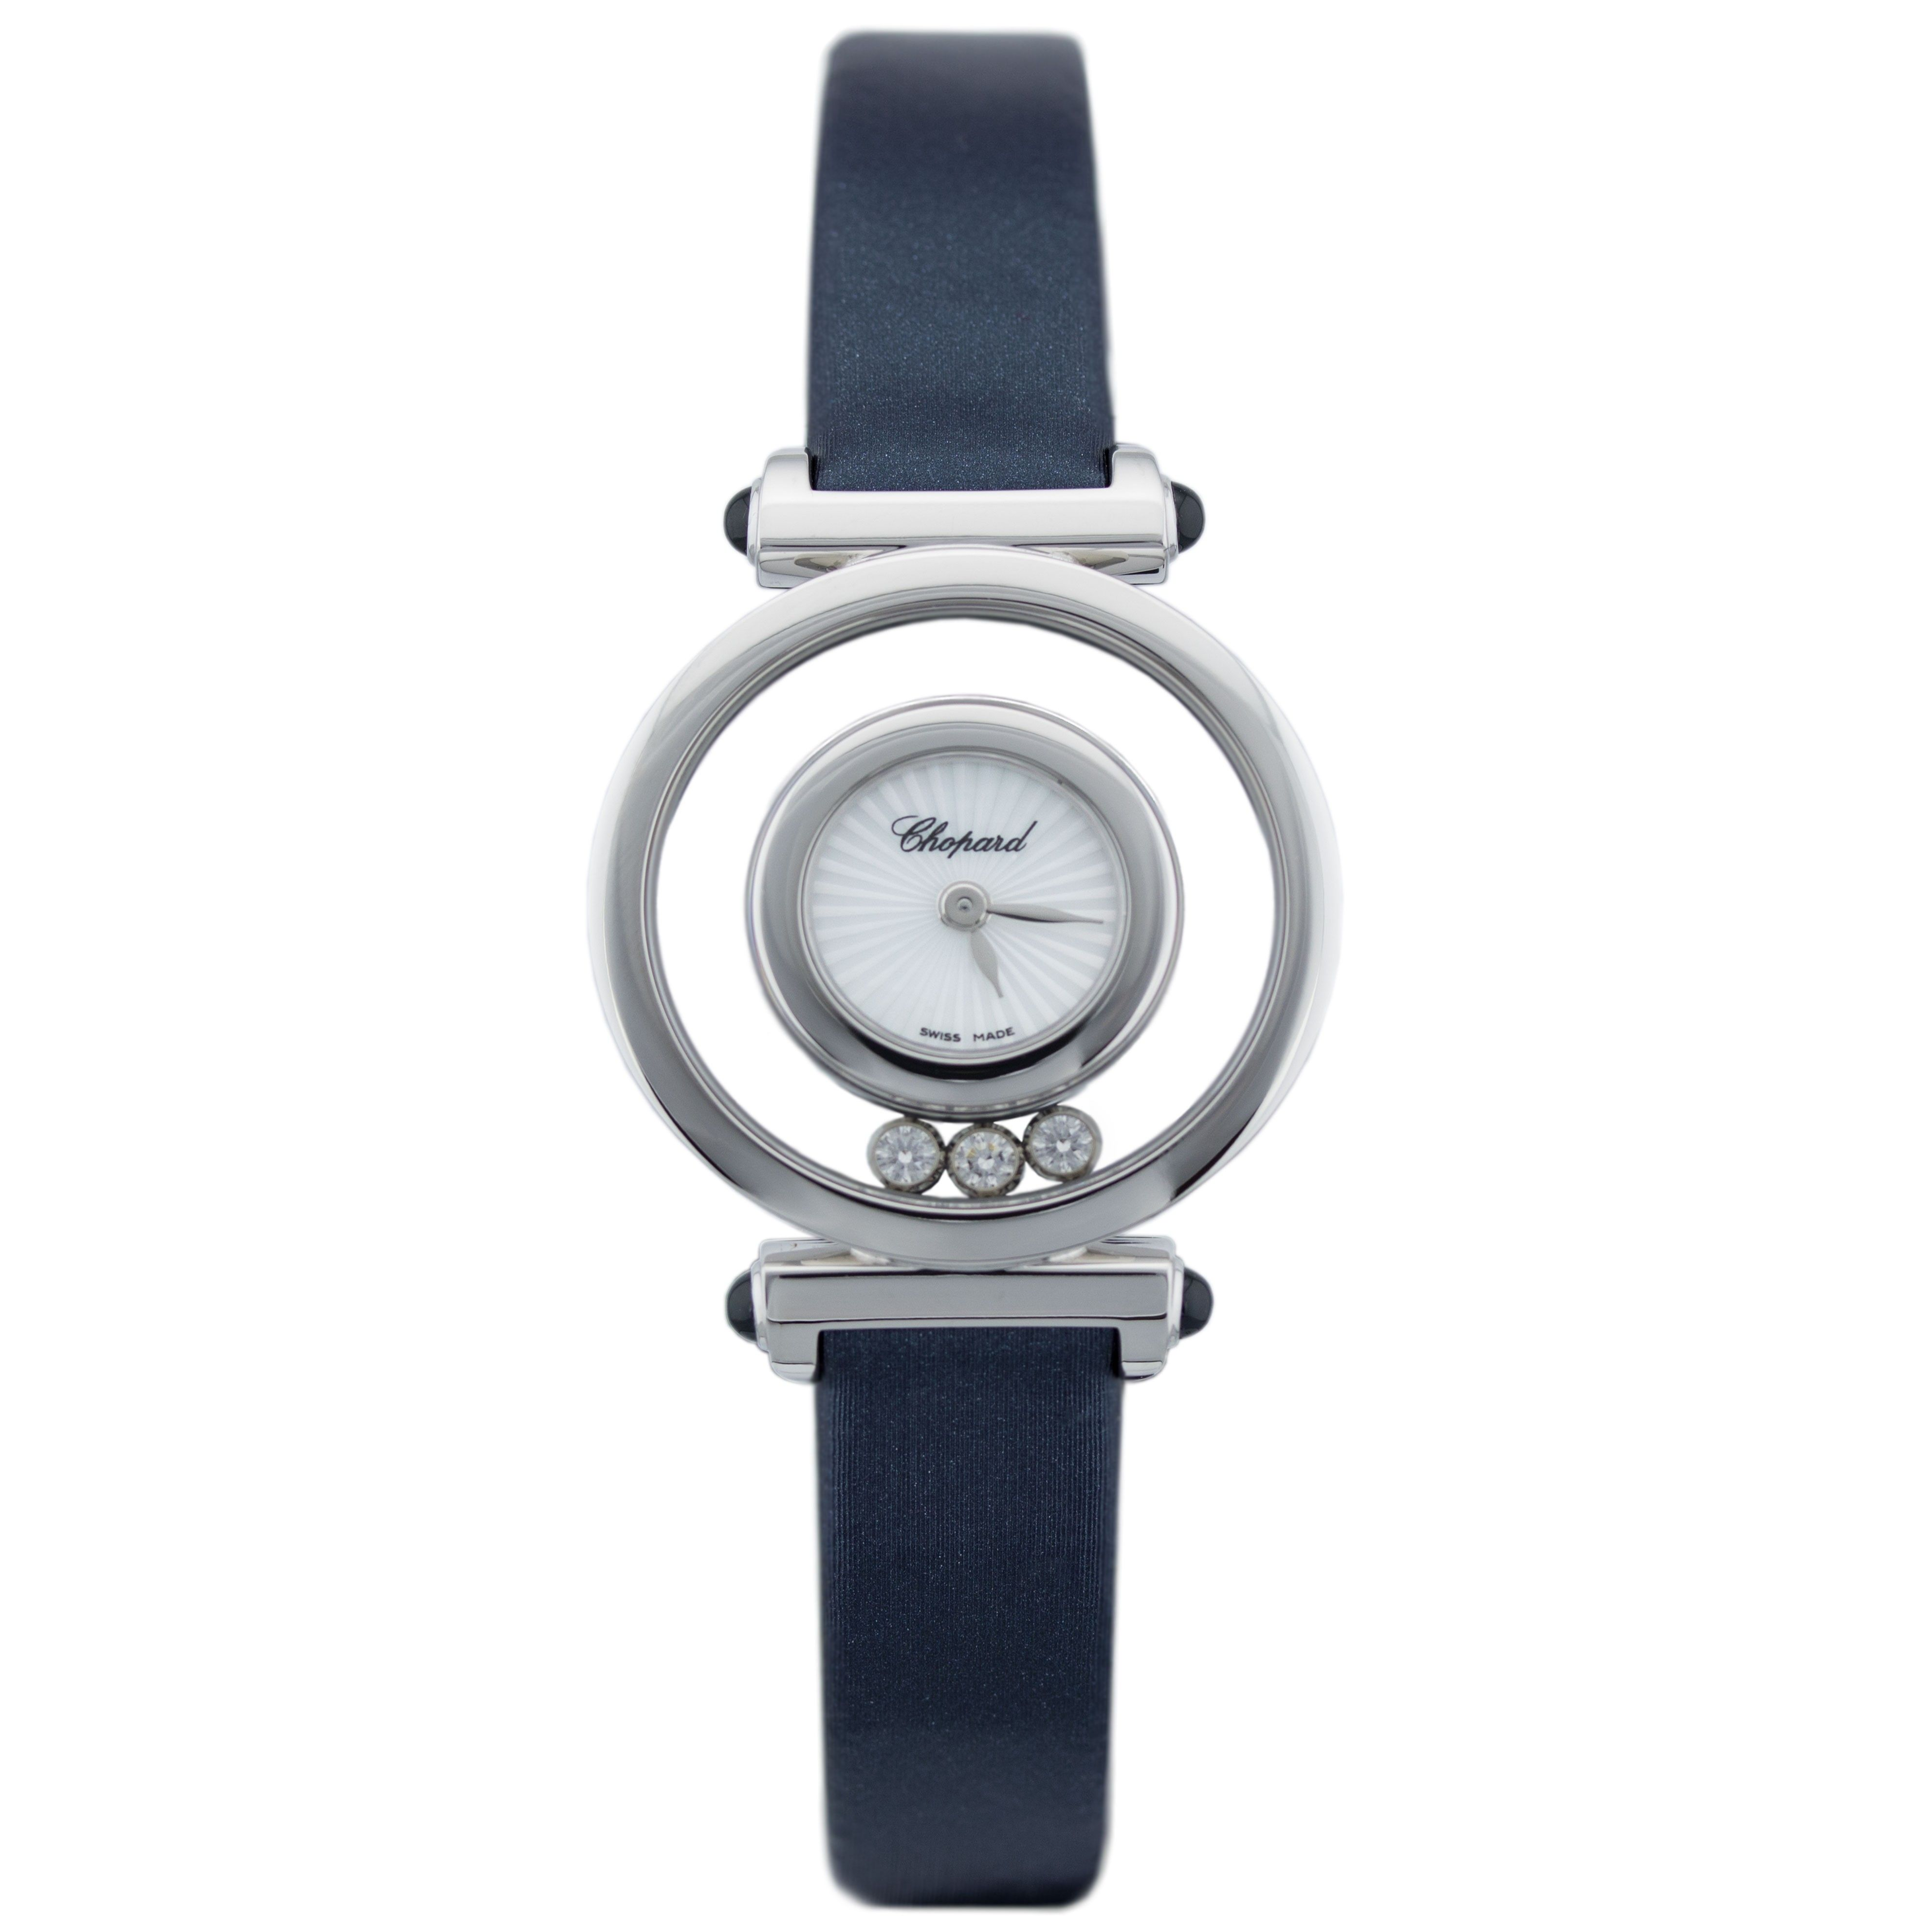 9f2cfba60f3a Chopard Happy Diamonds Icons Watch 204780-1201 Regular Price  €6